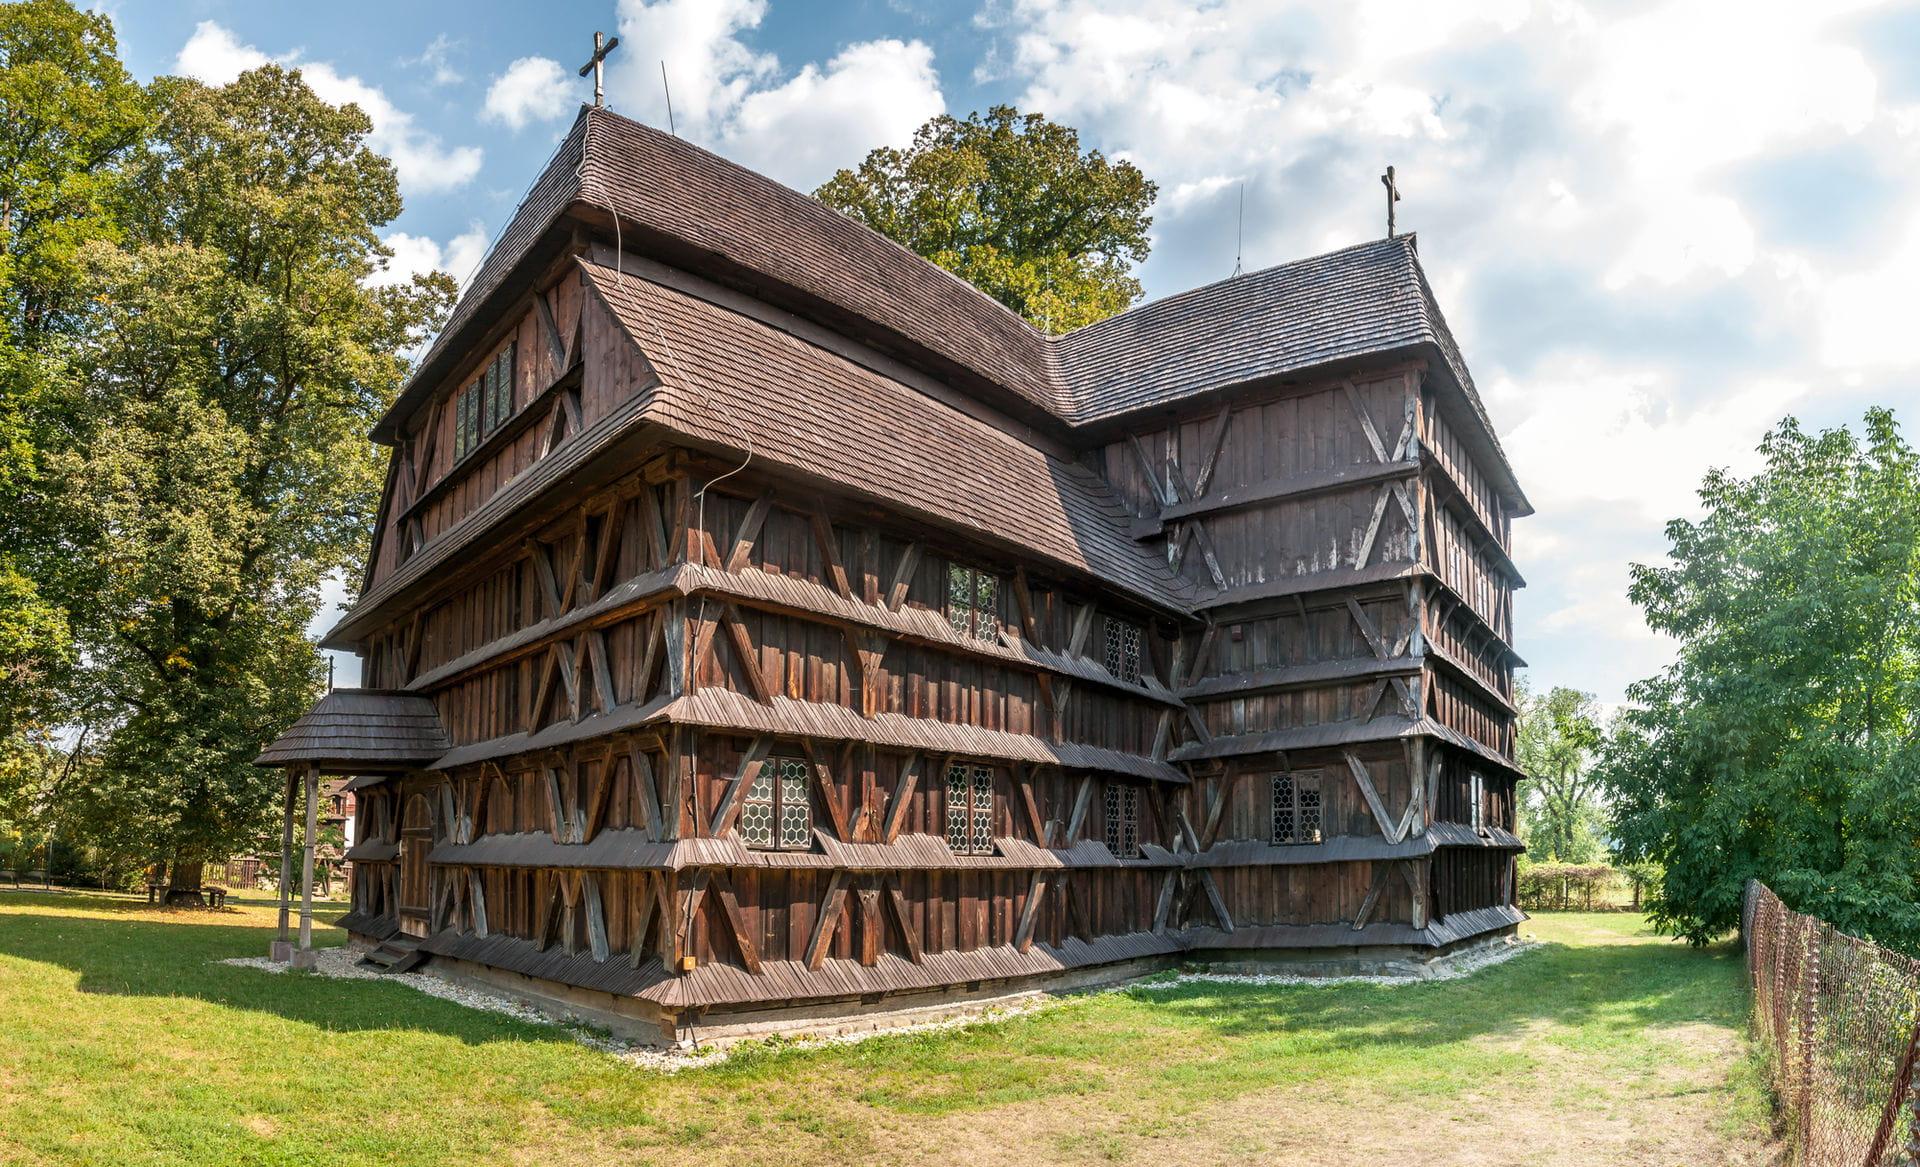 High quality hoto of Hronsek Wooden Church - Slovakia